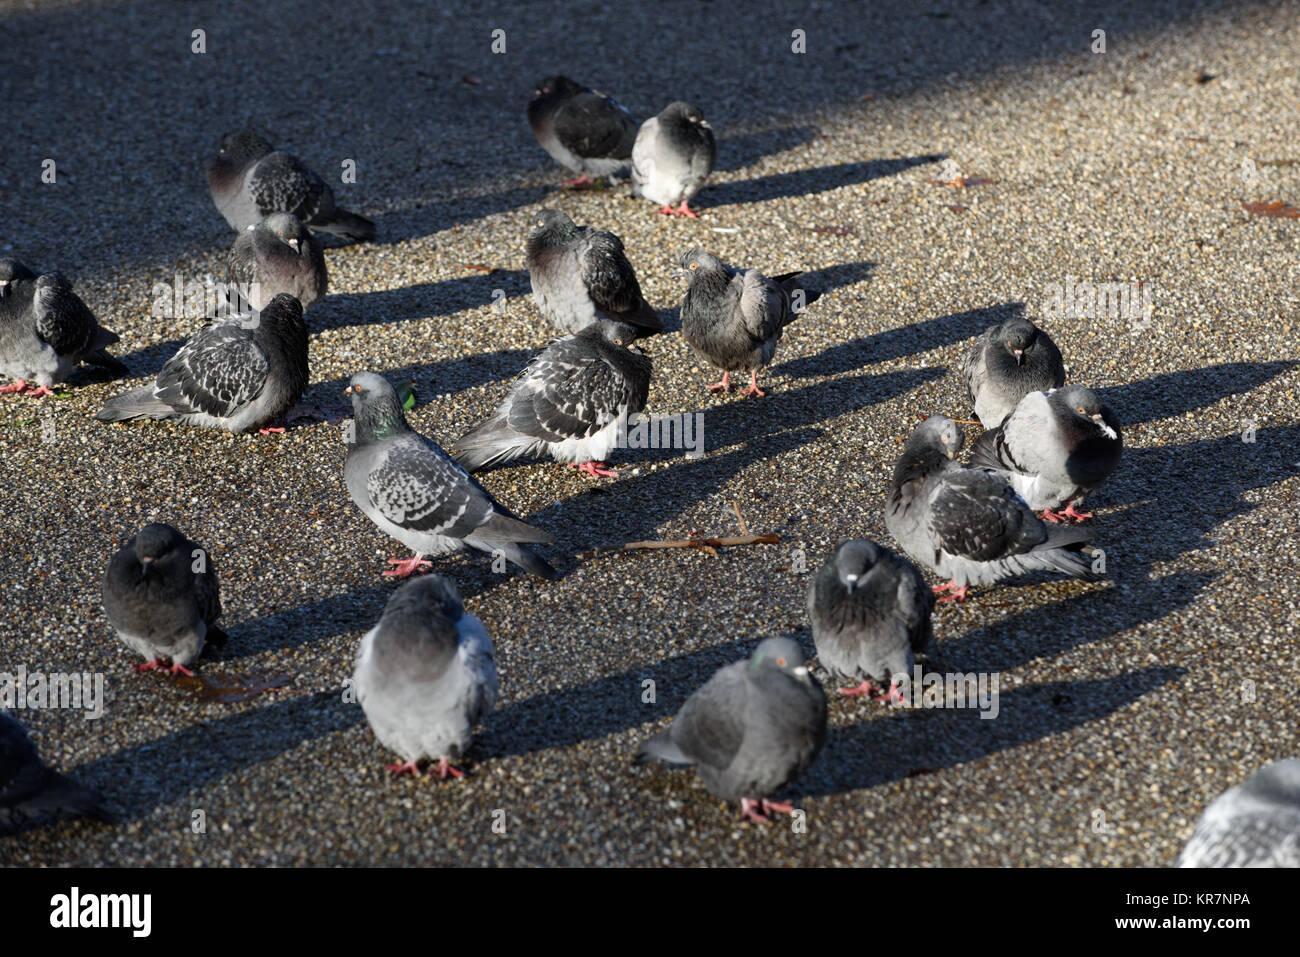 Pidgeons in London - Stock Image